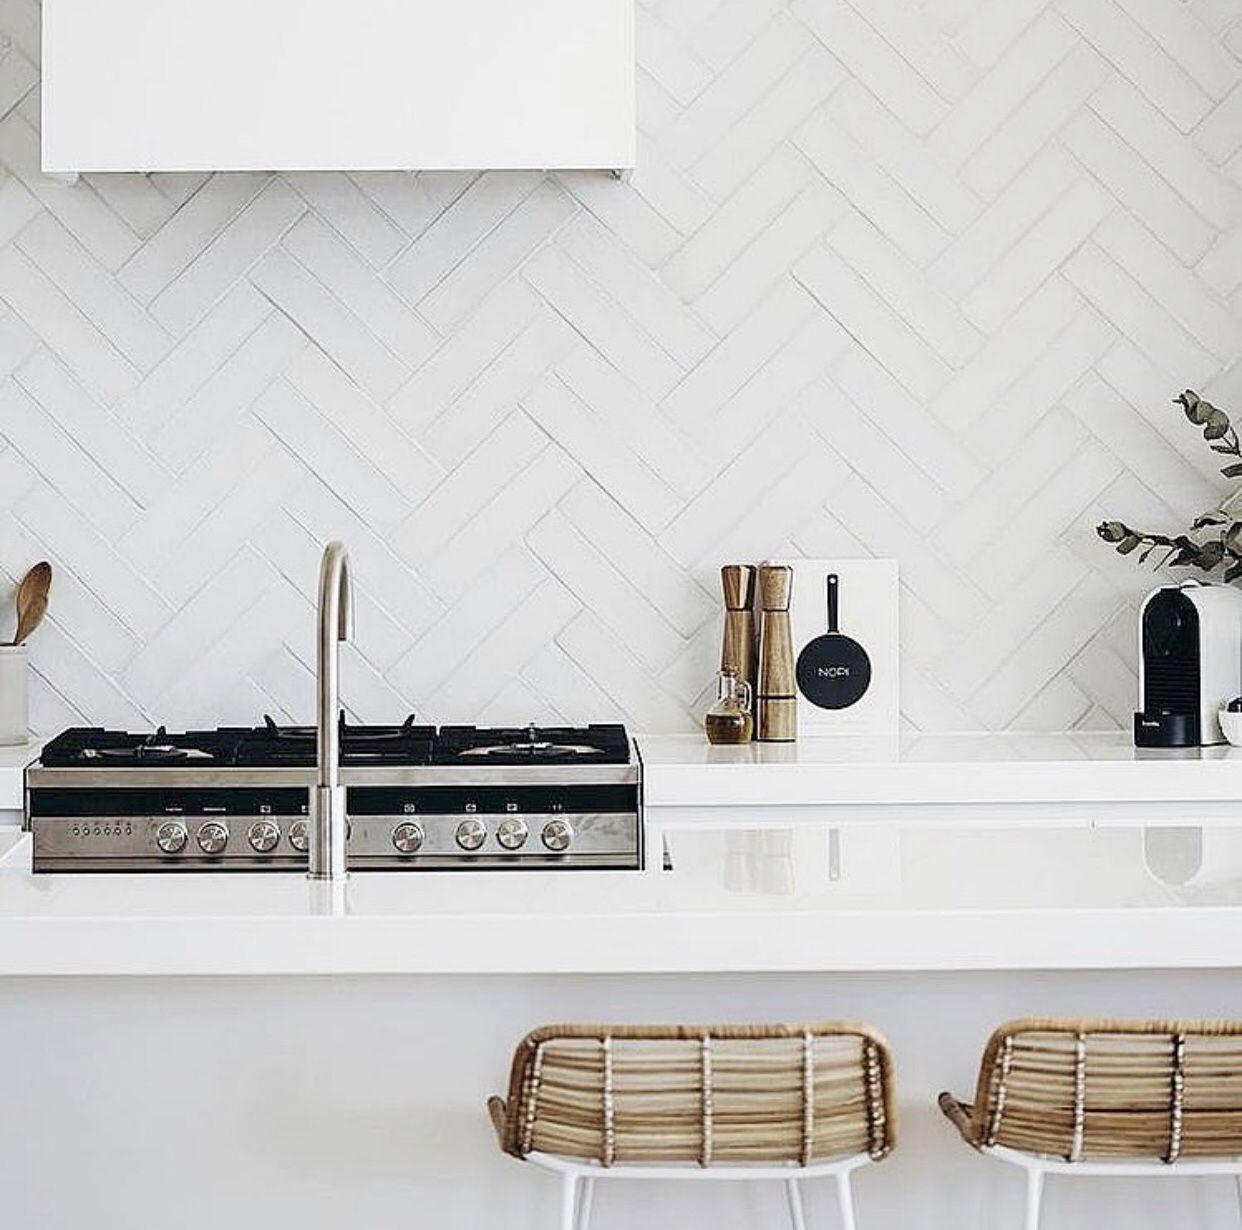 Pin By C A I T I E On D E T A I L S In 2019 Modern Kitchen